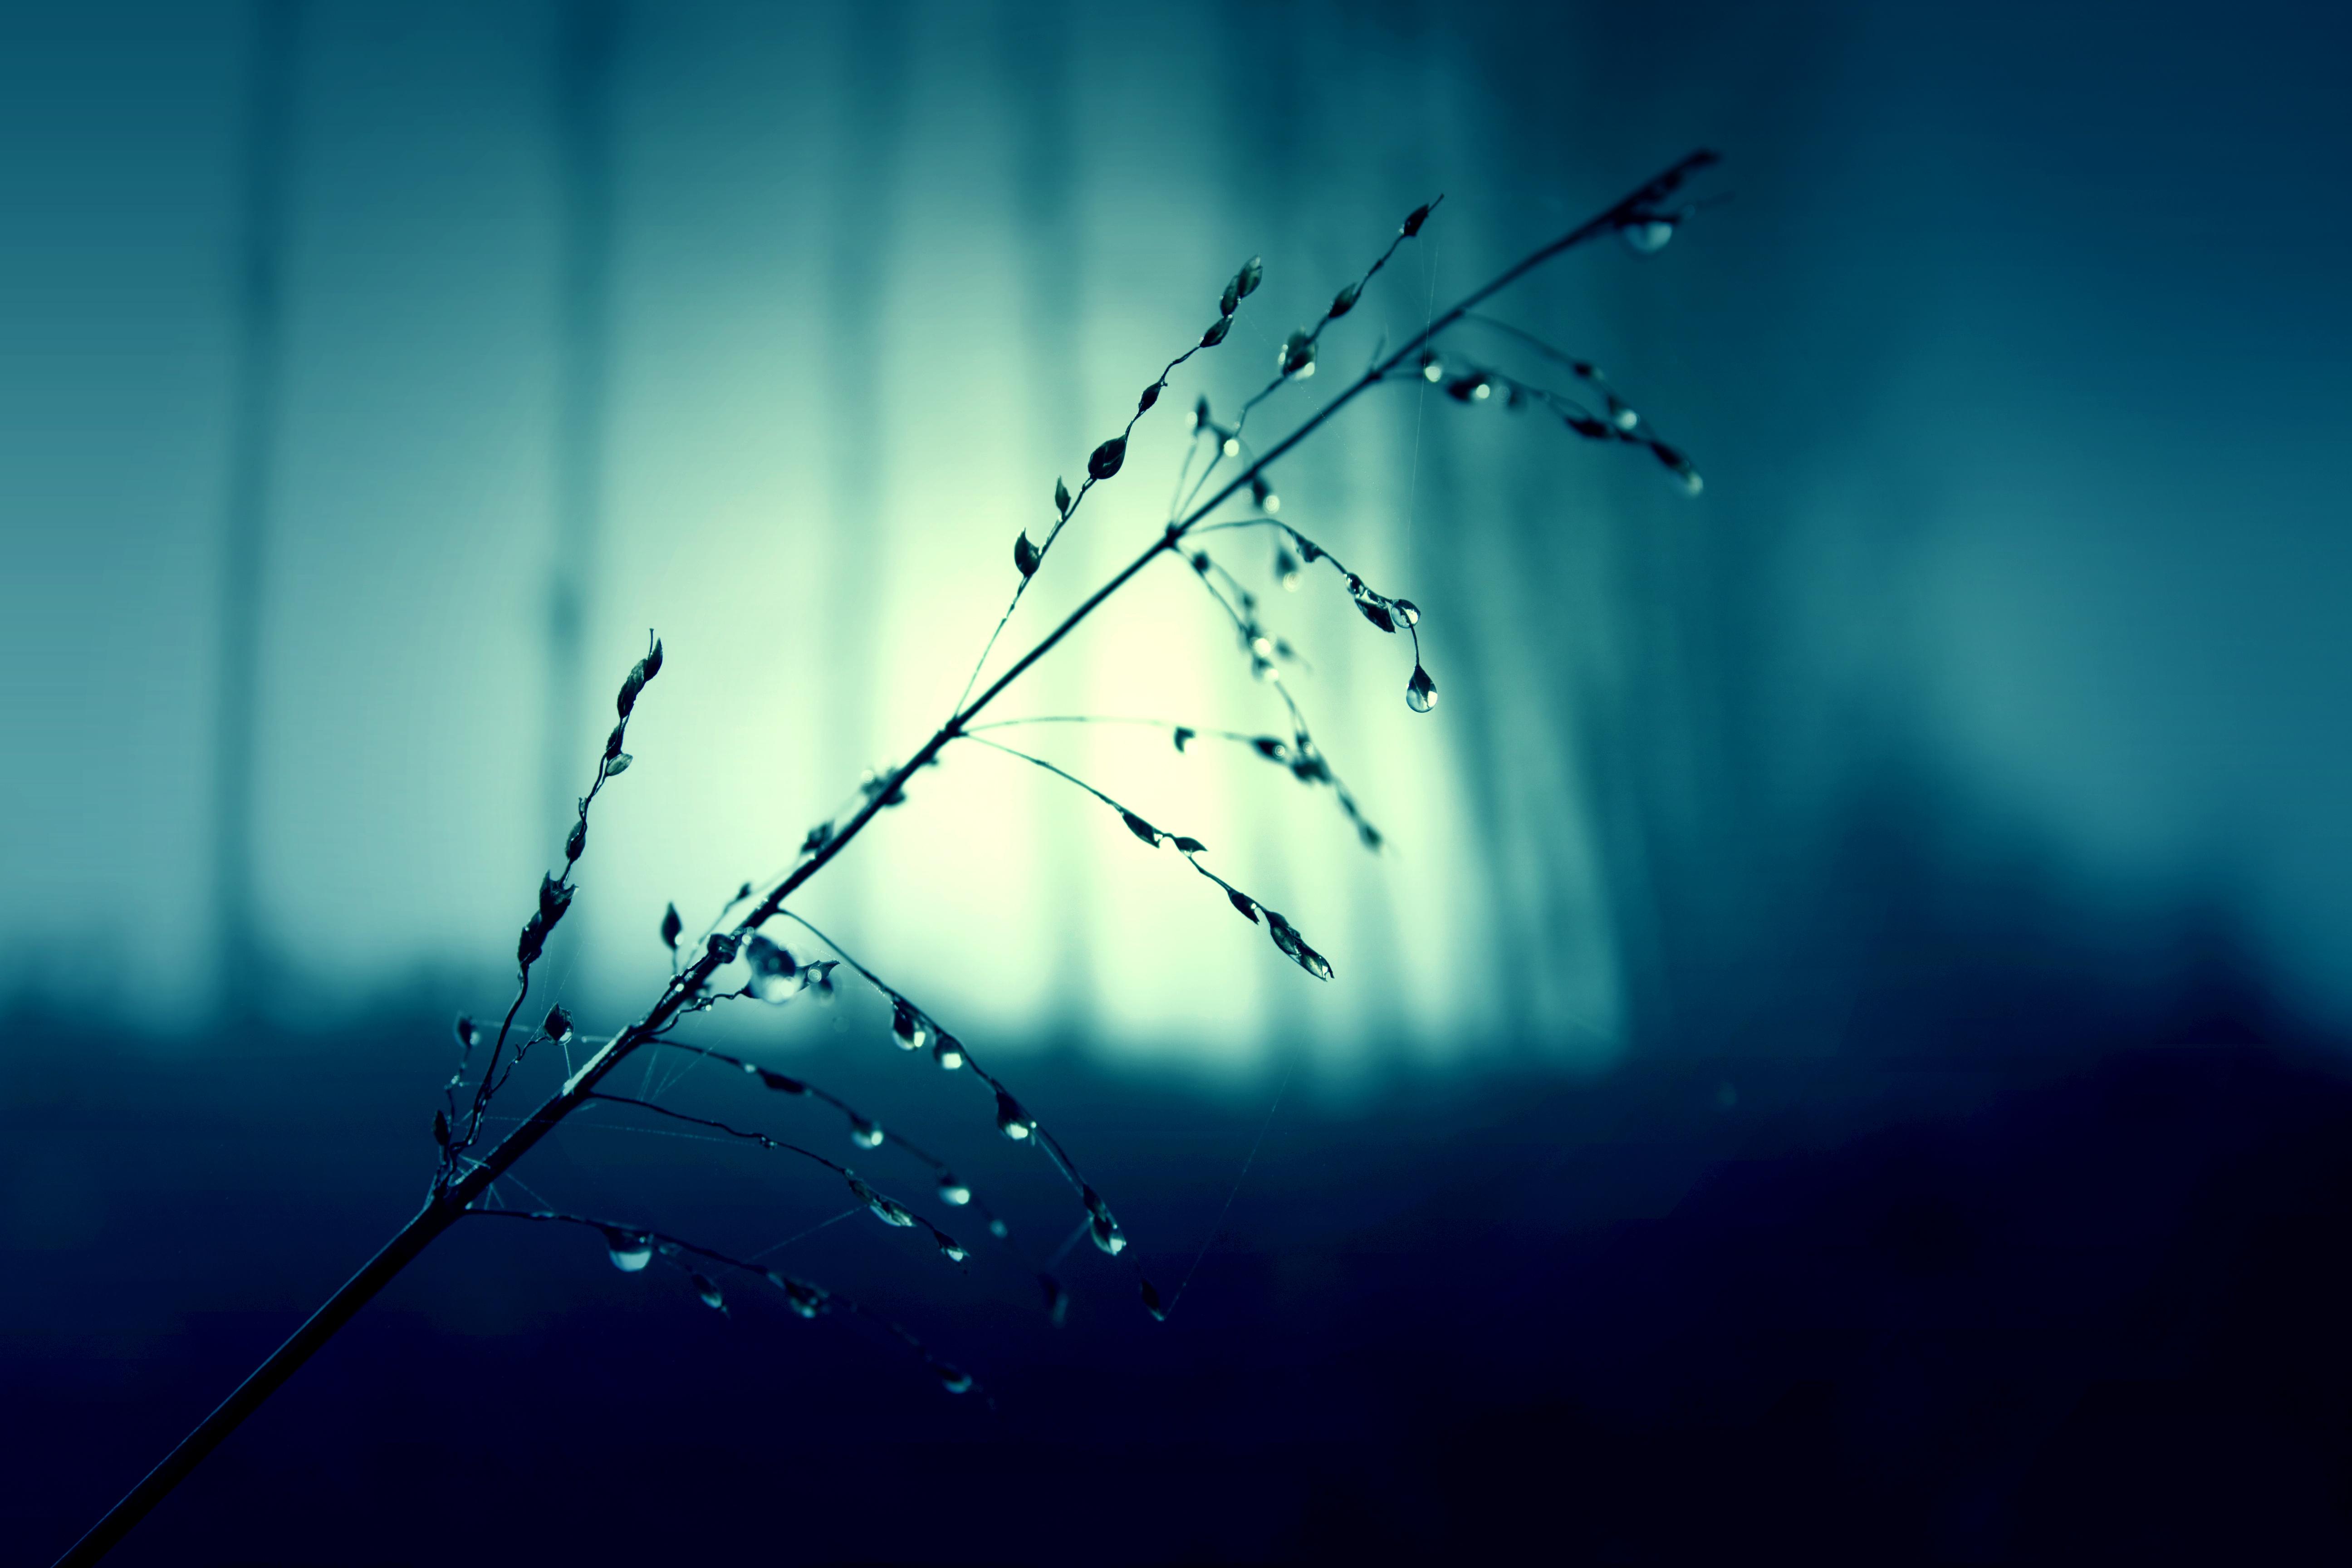 strå med regn